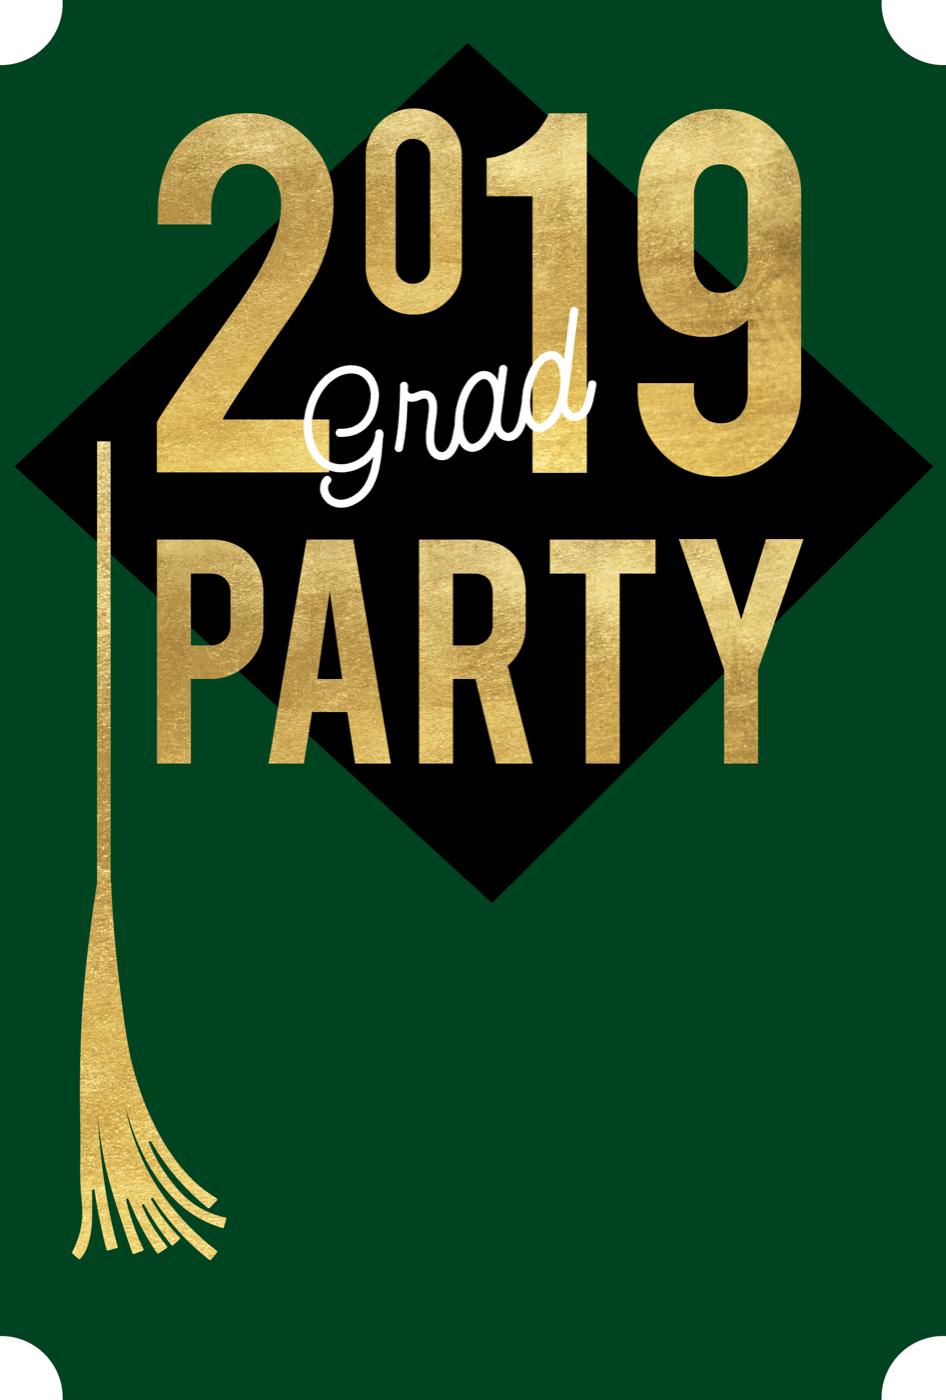 5 Editable Graduation Party Invitation Templates + Tips Pertaining To Graduation Party Invitation Templates Free Word